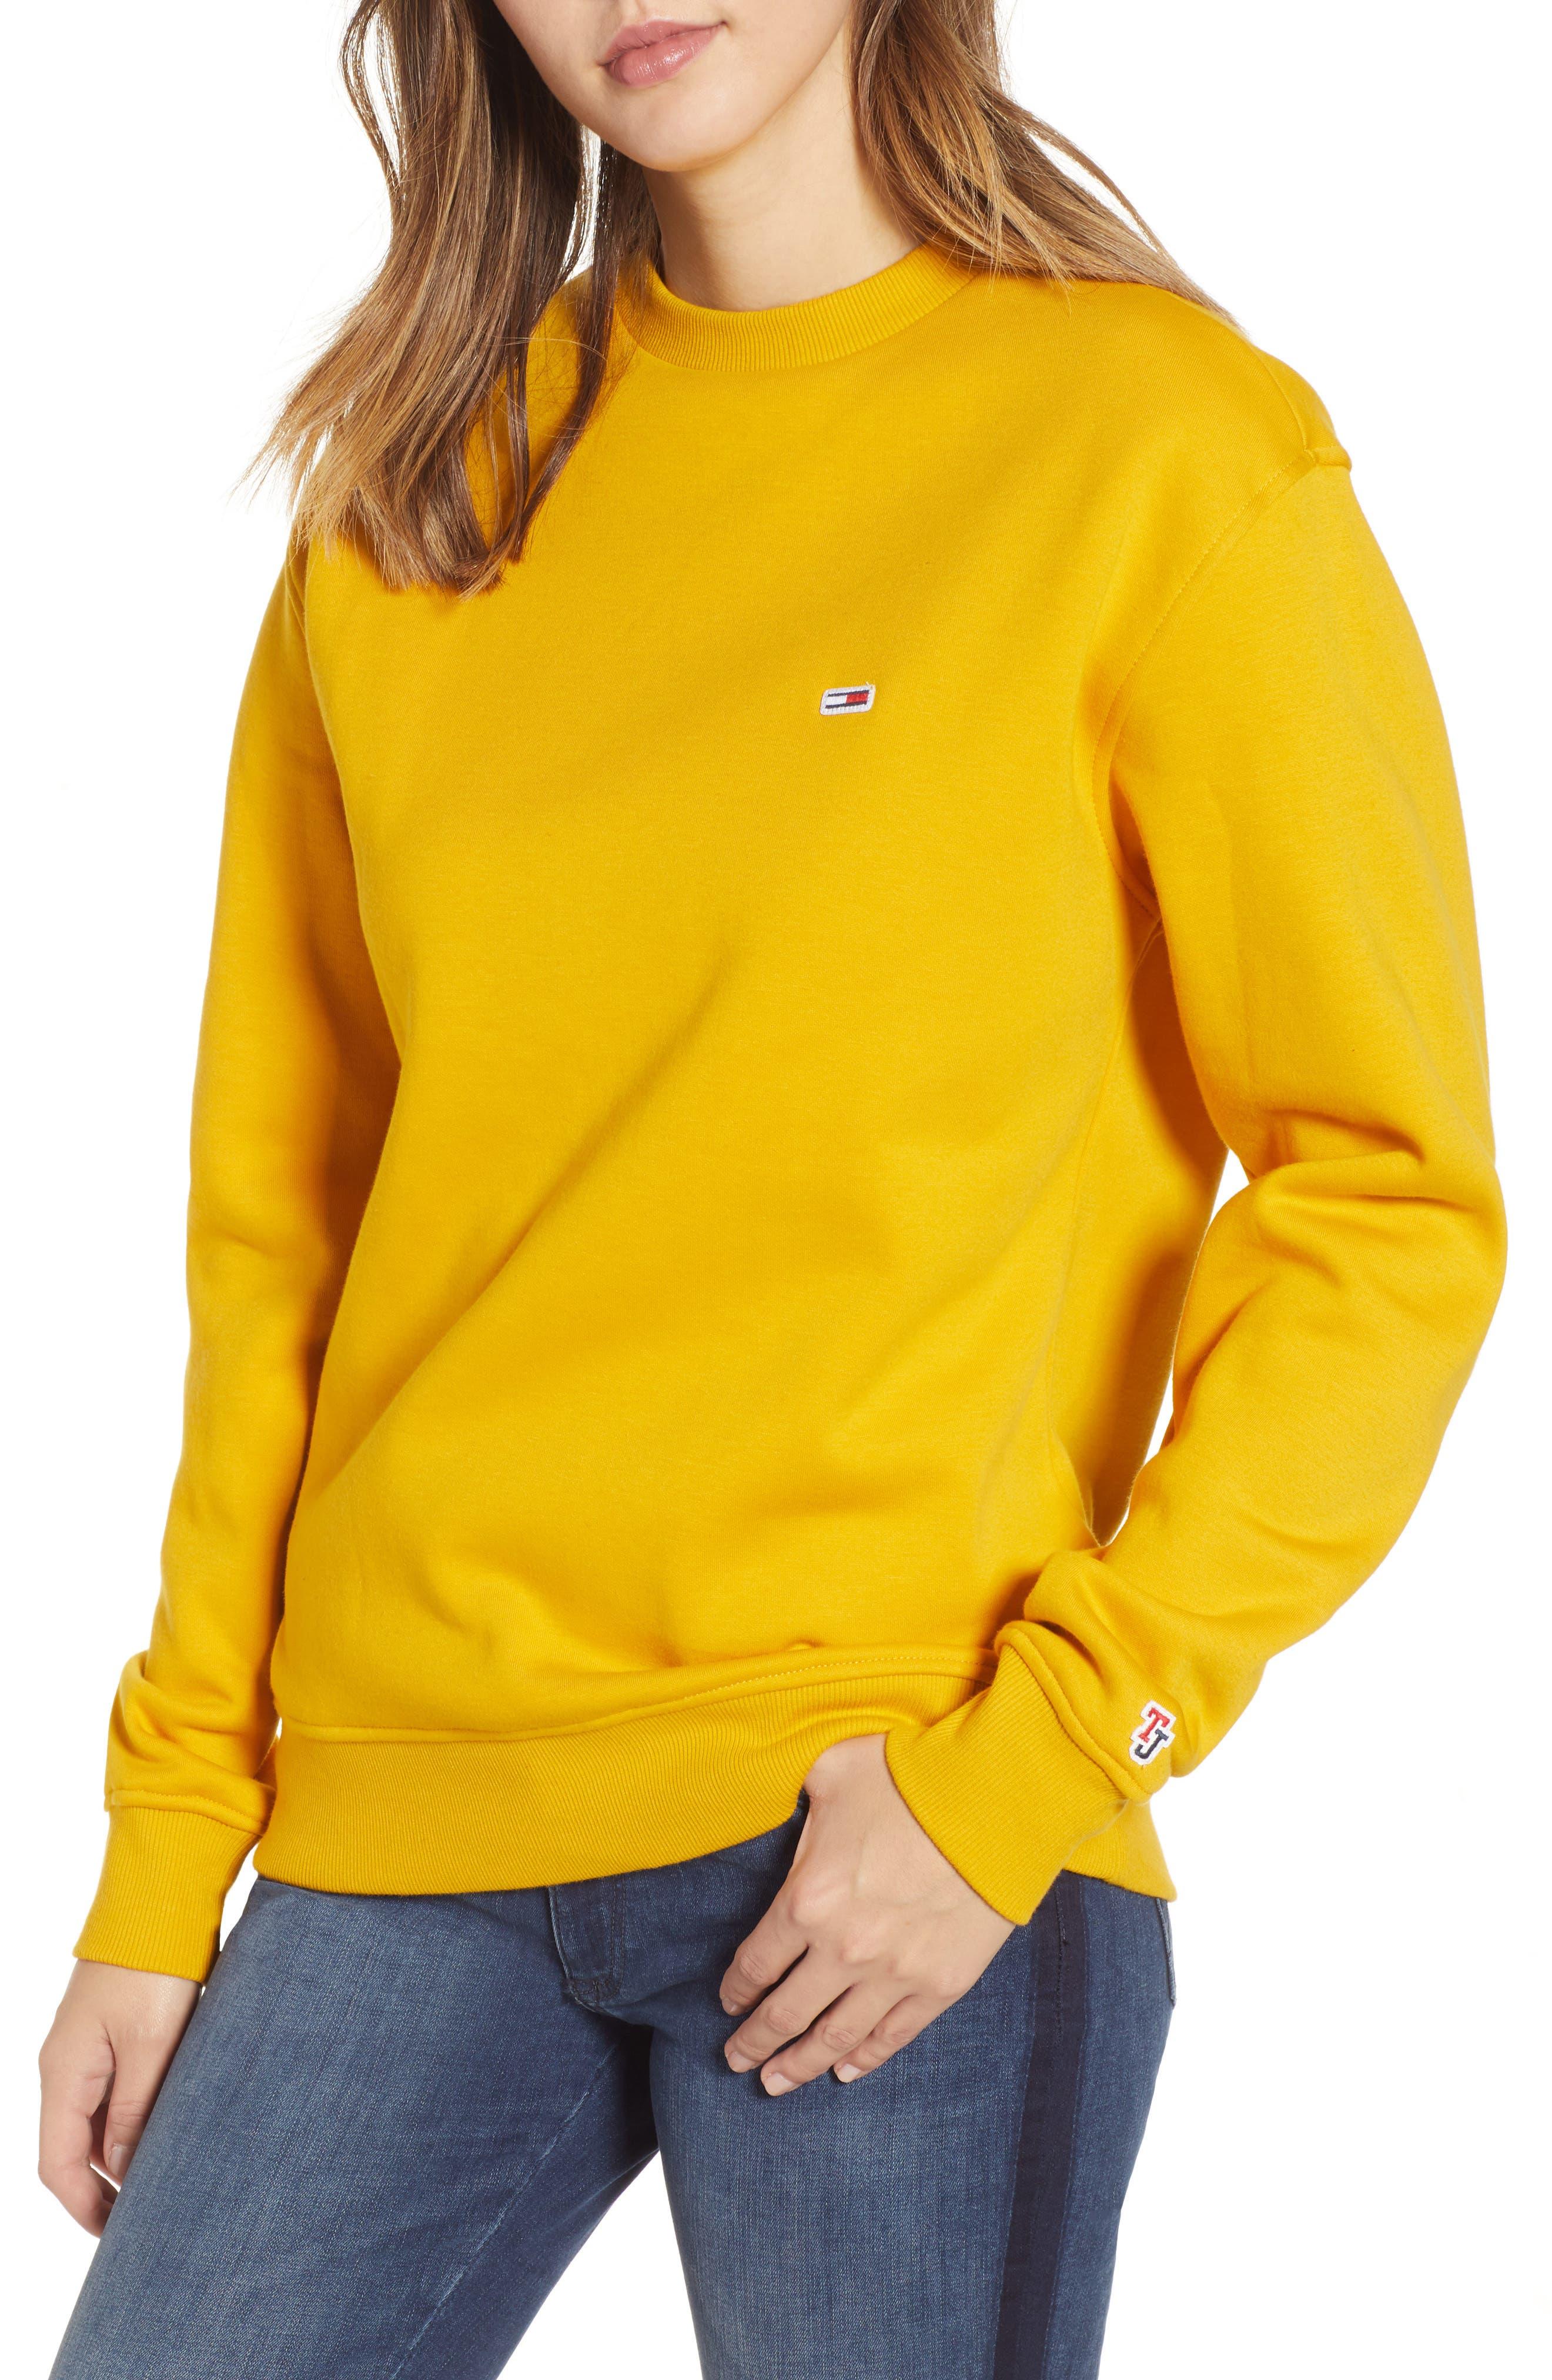 TJW Tommy Classics Sweatshirt,                             Main thumbnail 1, color,                             701